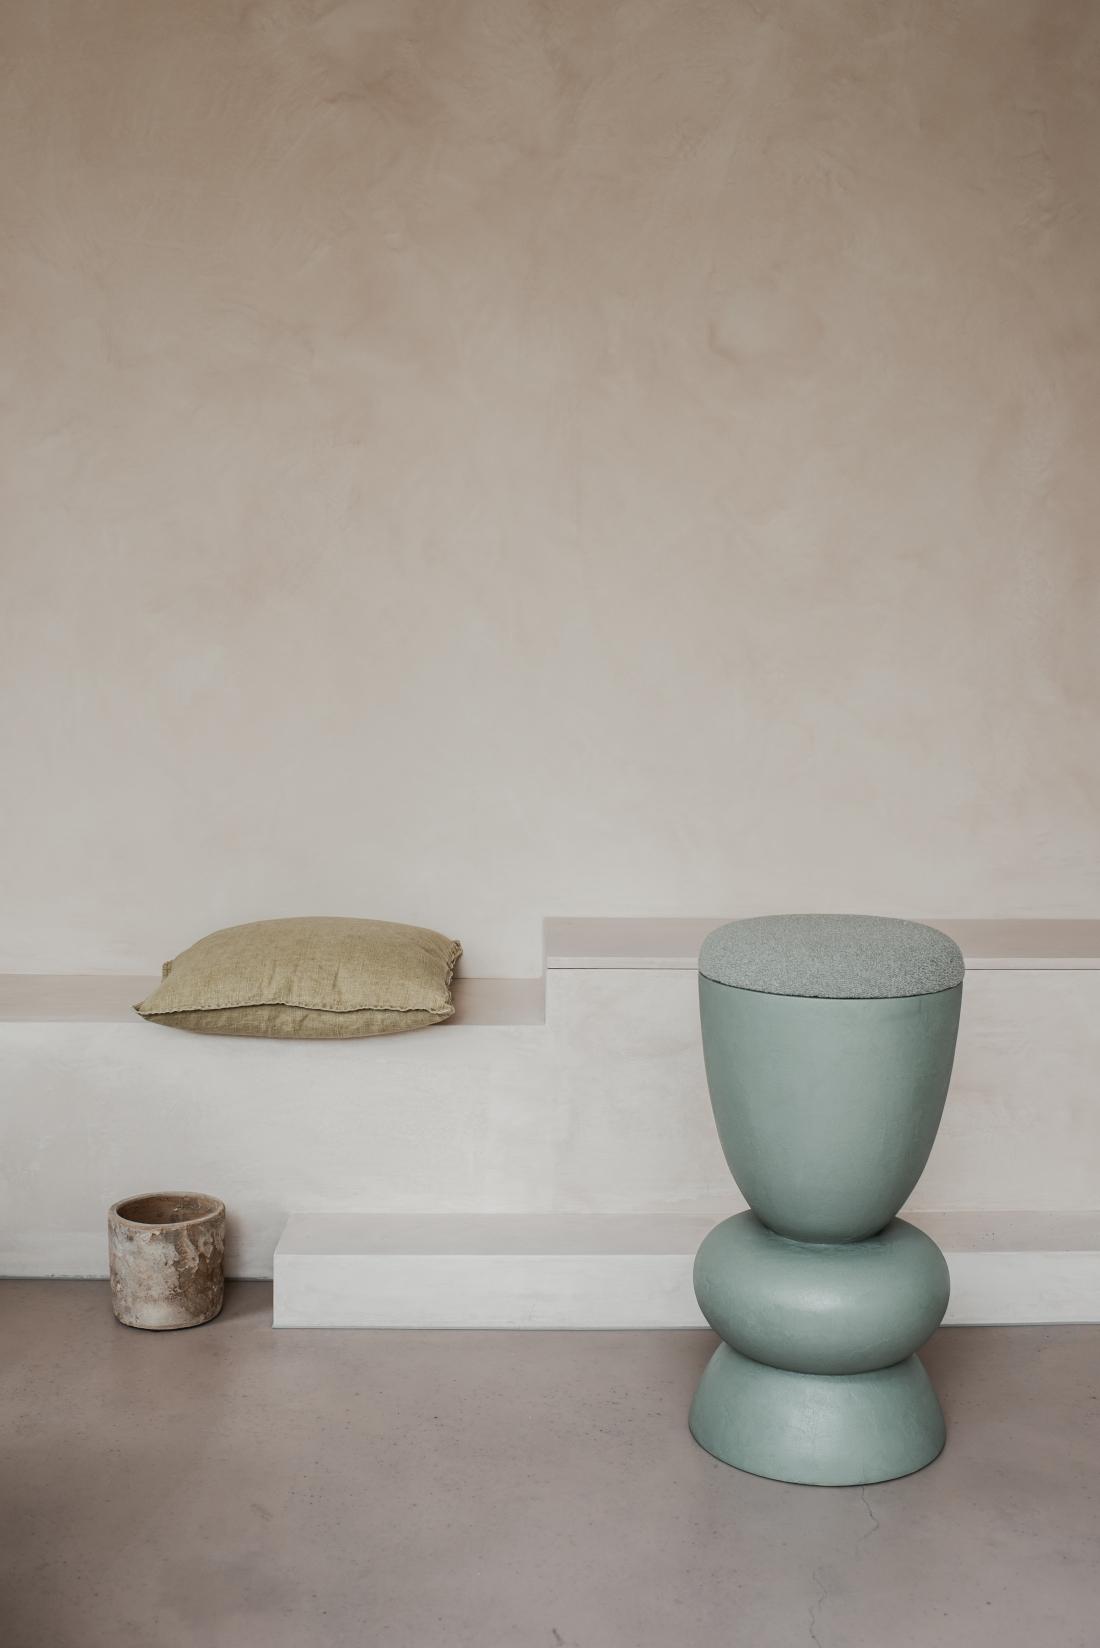 Sella Concept Ladies Pond stool Photo credit Genevieve Lutkin